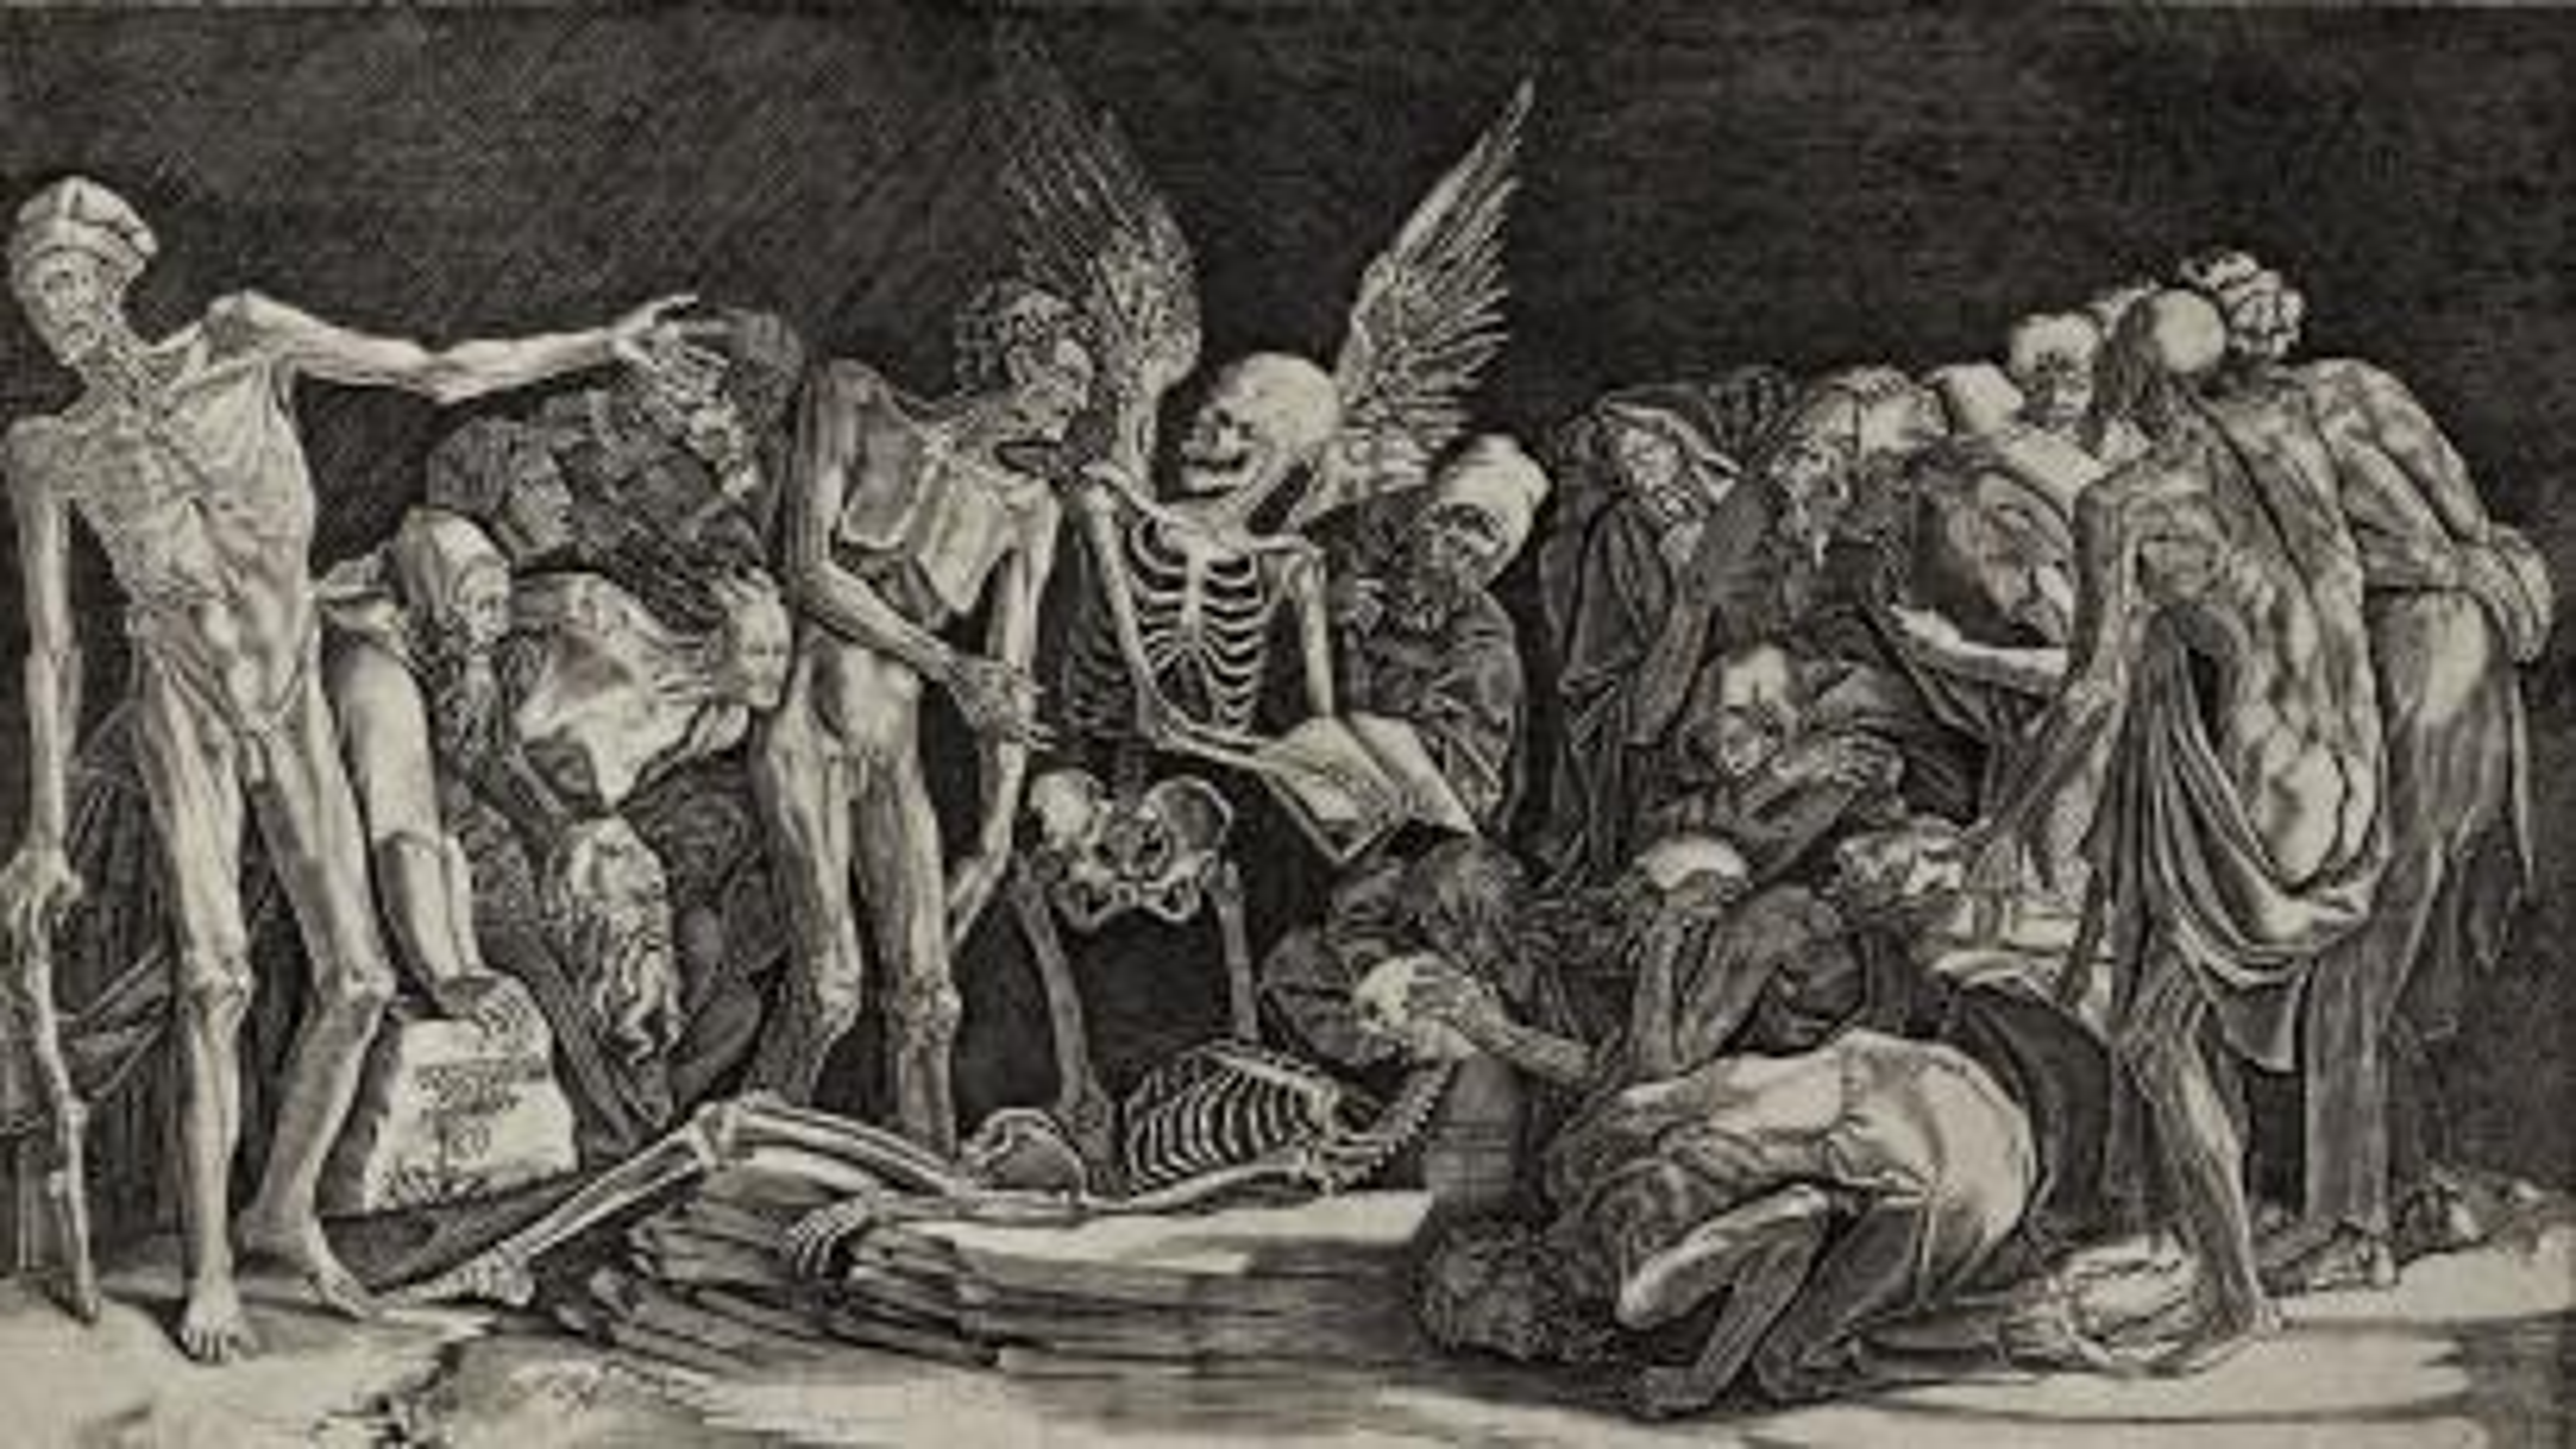 The Skeletons, a 1518 engraving depicting the devil